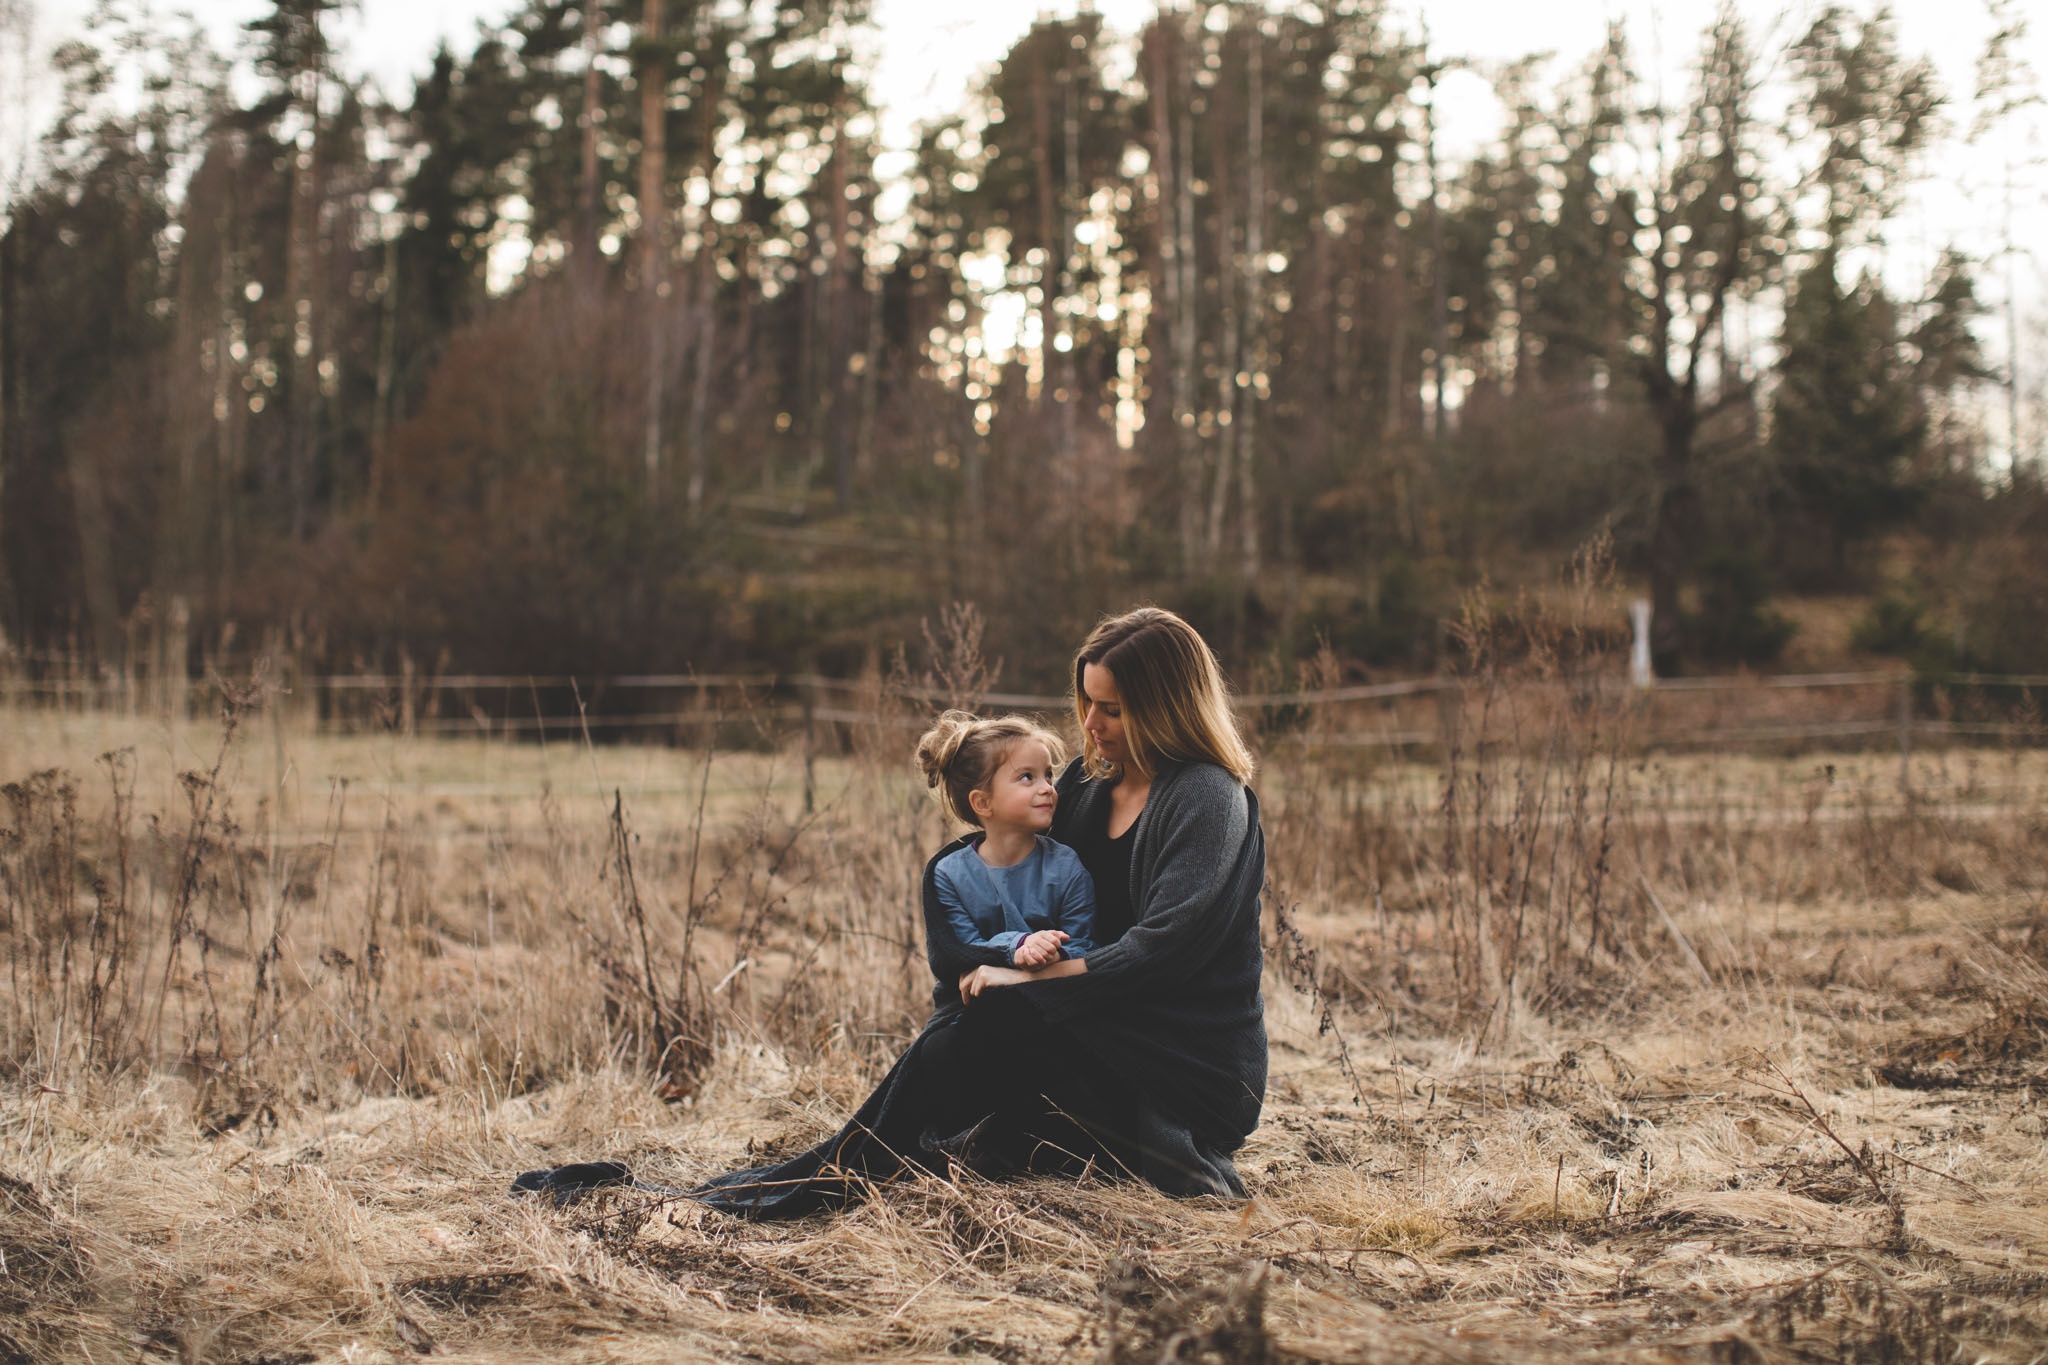 Familiefotografering - natur, lys, skog, mor, datter - Fotograf Ida Hvattum